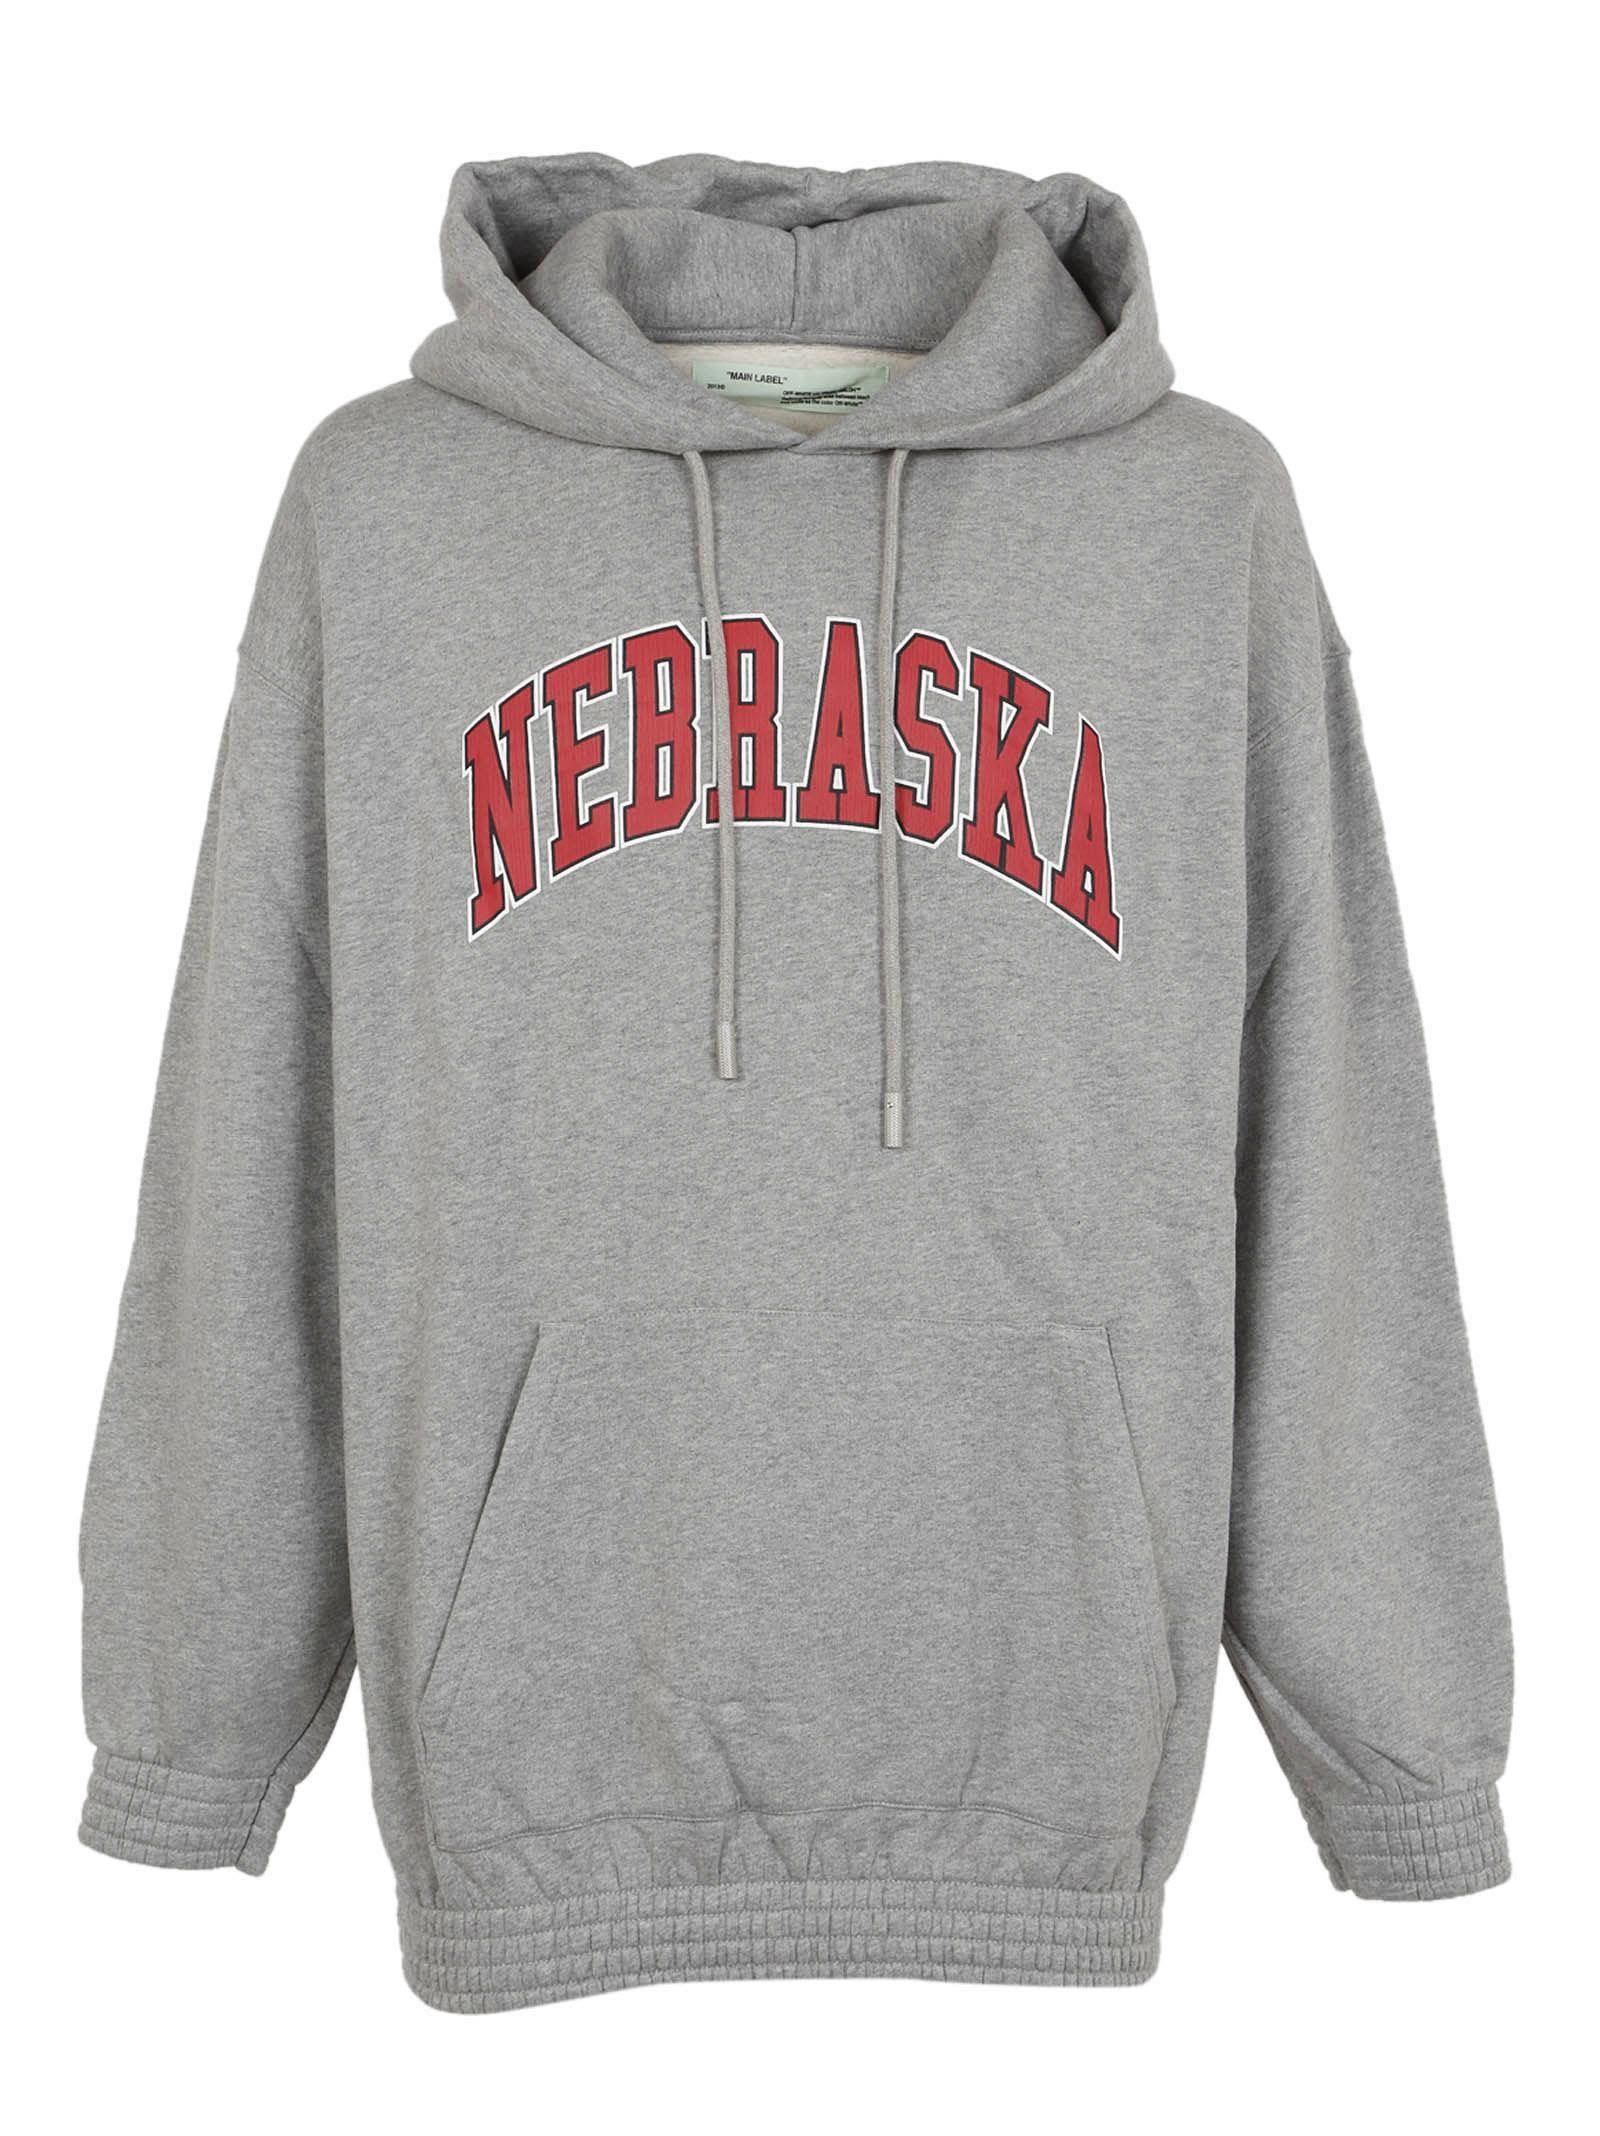 Off White Nebraska Printed Hoodie Cloth Hoodieku Sweater Striped Crewneck Maroon Unisex L Clothes In 2018 Pinterest Hoodies And